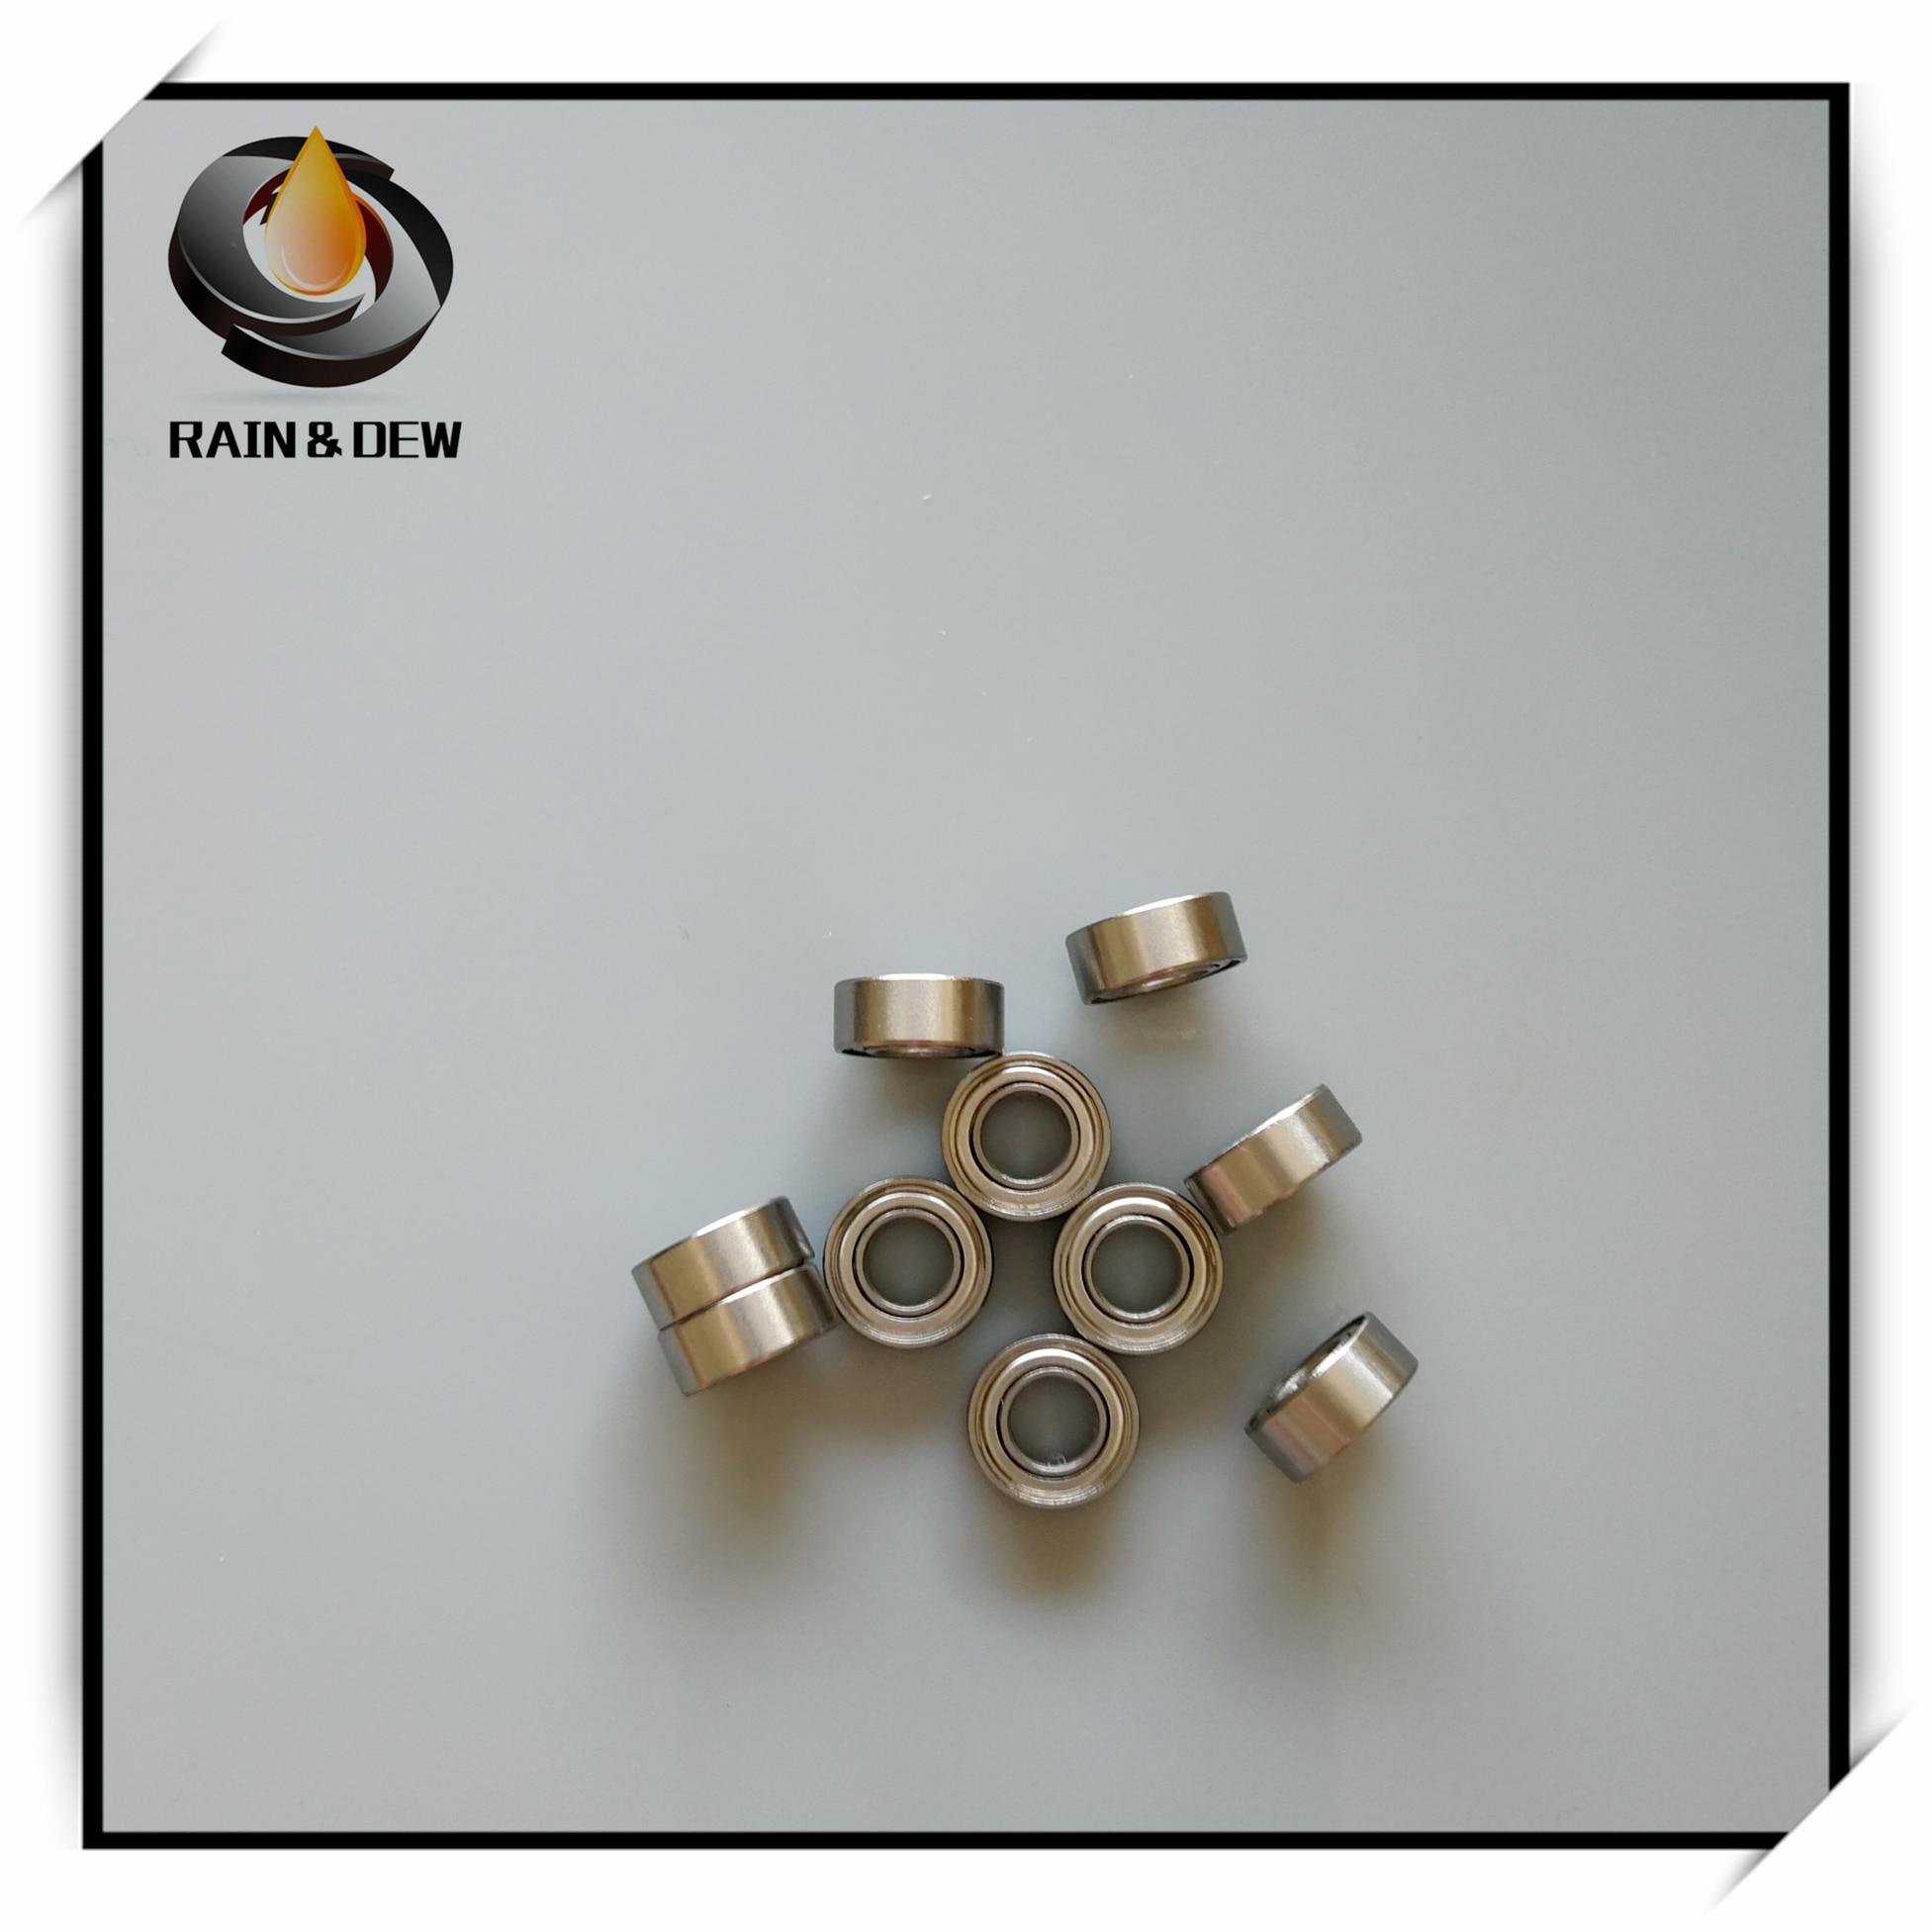 10Pcs SMR105ZZ ABEC-7 Stainless Steel Ball Bearing 5x10x4 mm Miniature MR105 MR105ZZ Ball Bearings L-1050ZZ